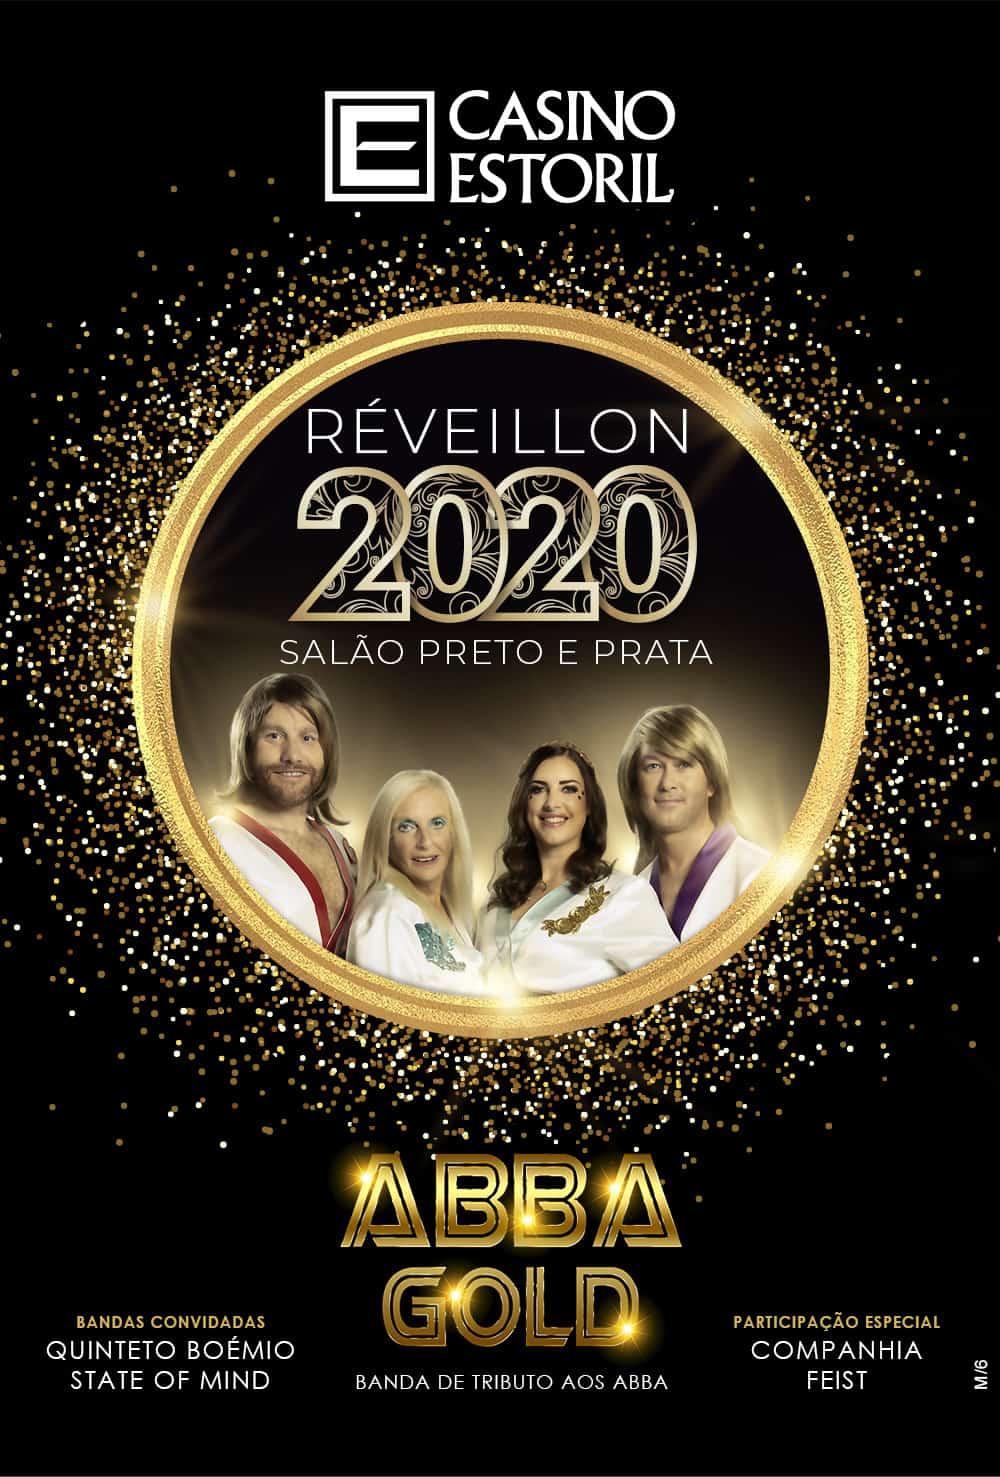 RÉVEILLON 2019/2020 – CASINO DO ESTORIL